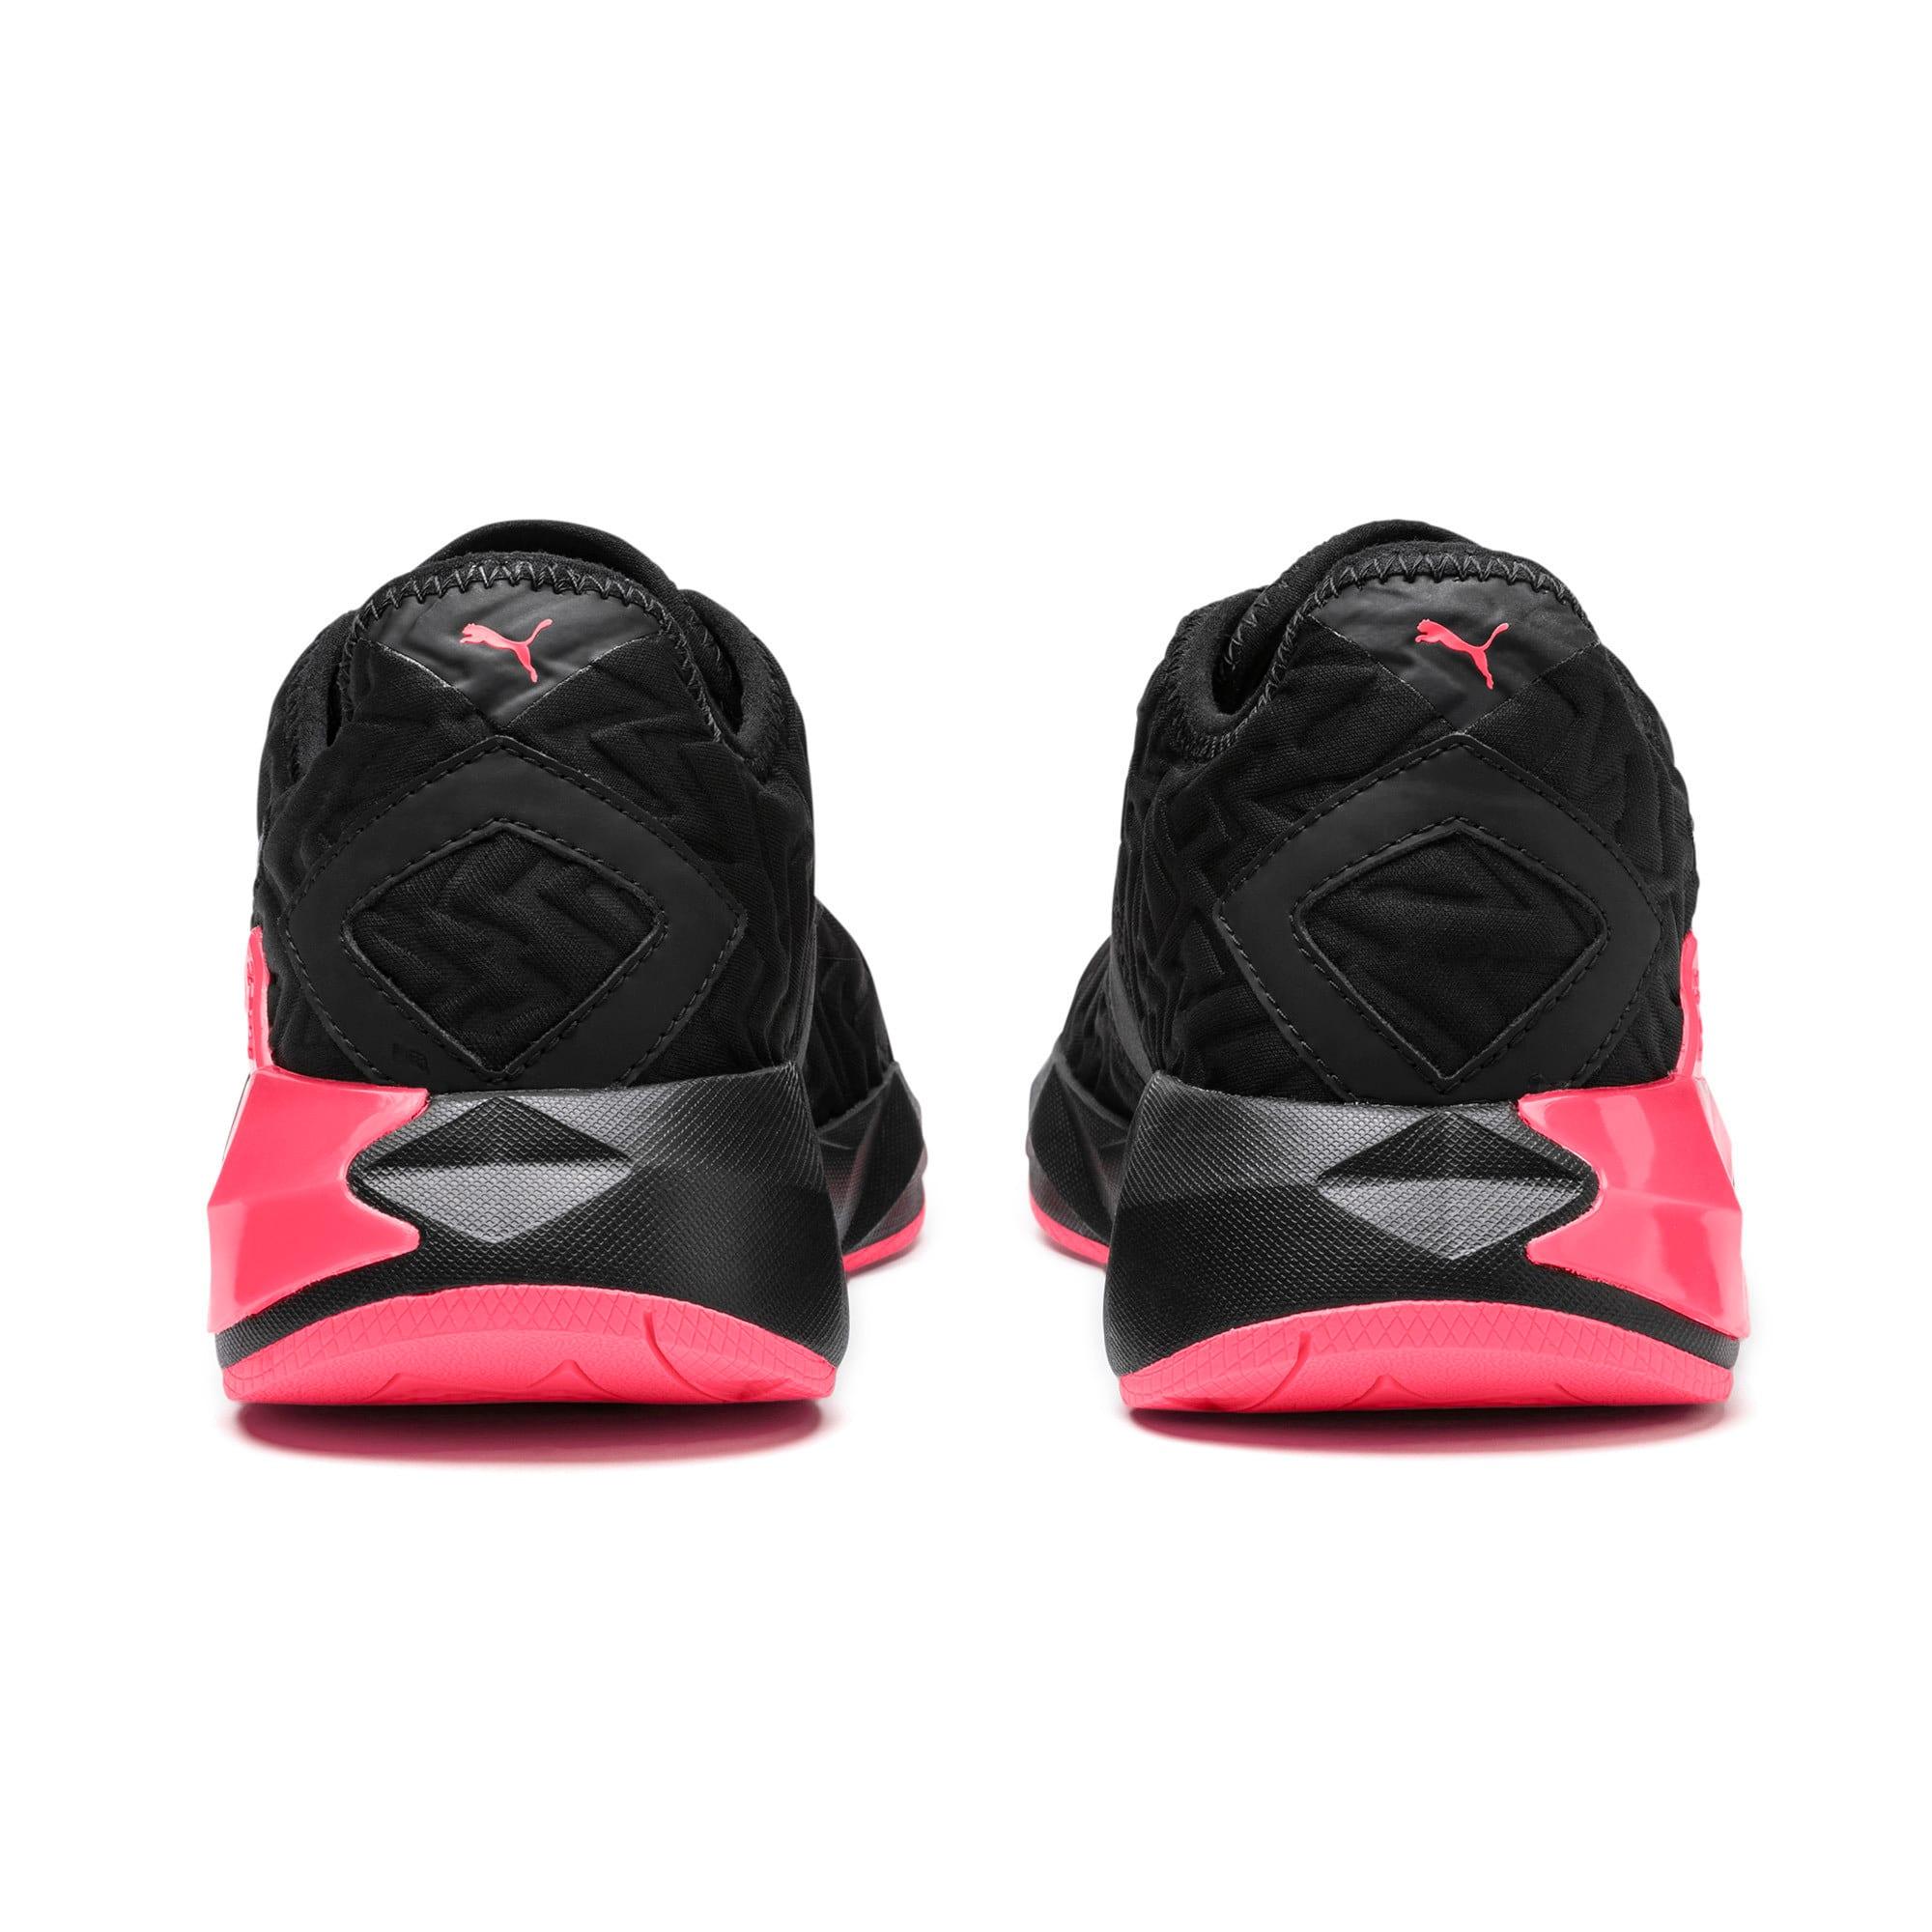 Thumbnail 3 of CELL Plasmic Fluorescent Women's Training Shoes, Puma Black-Pink Alert, medium